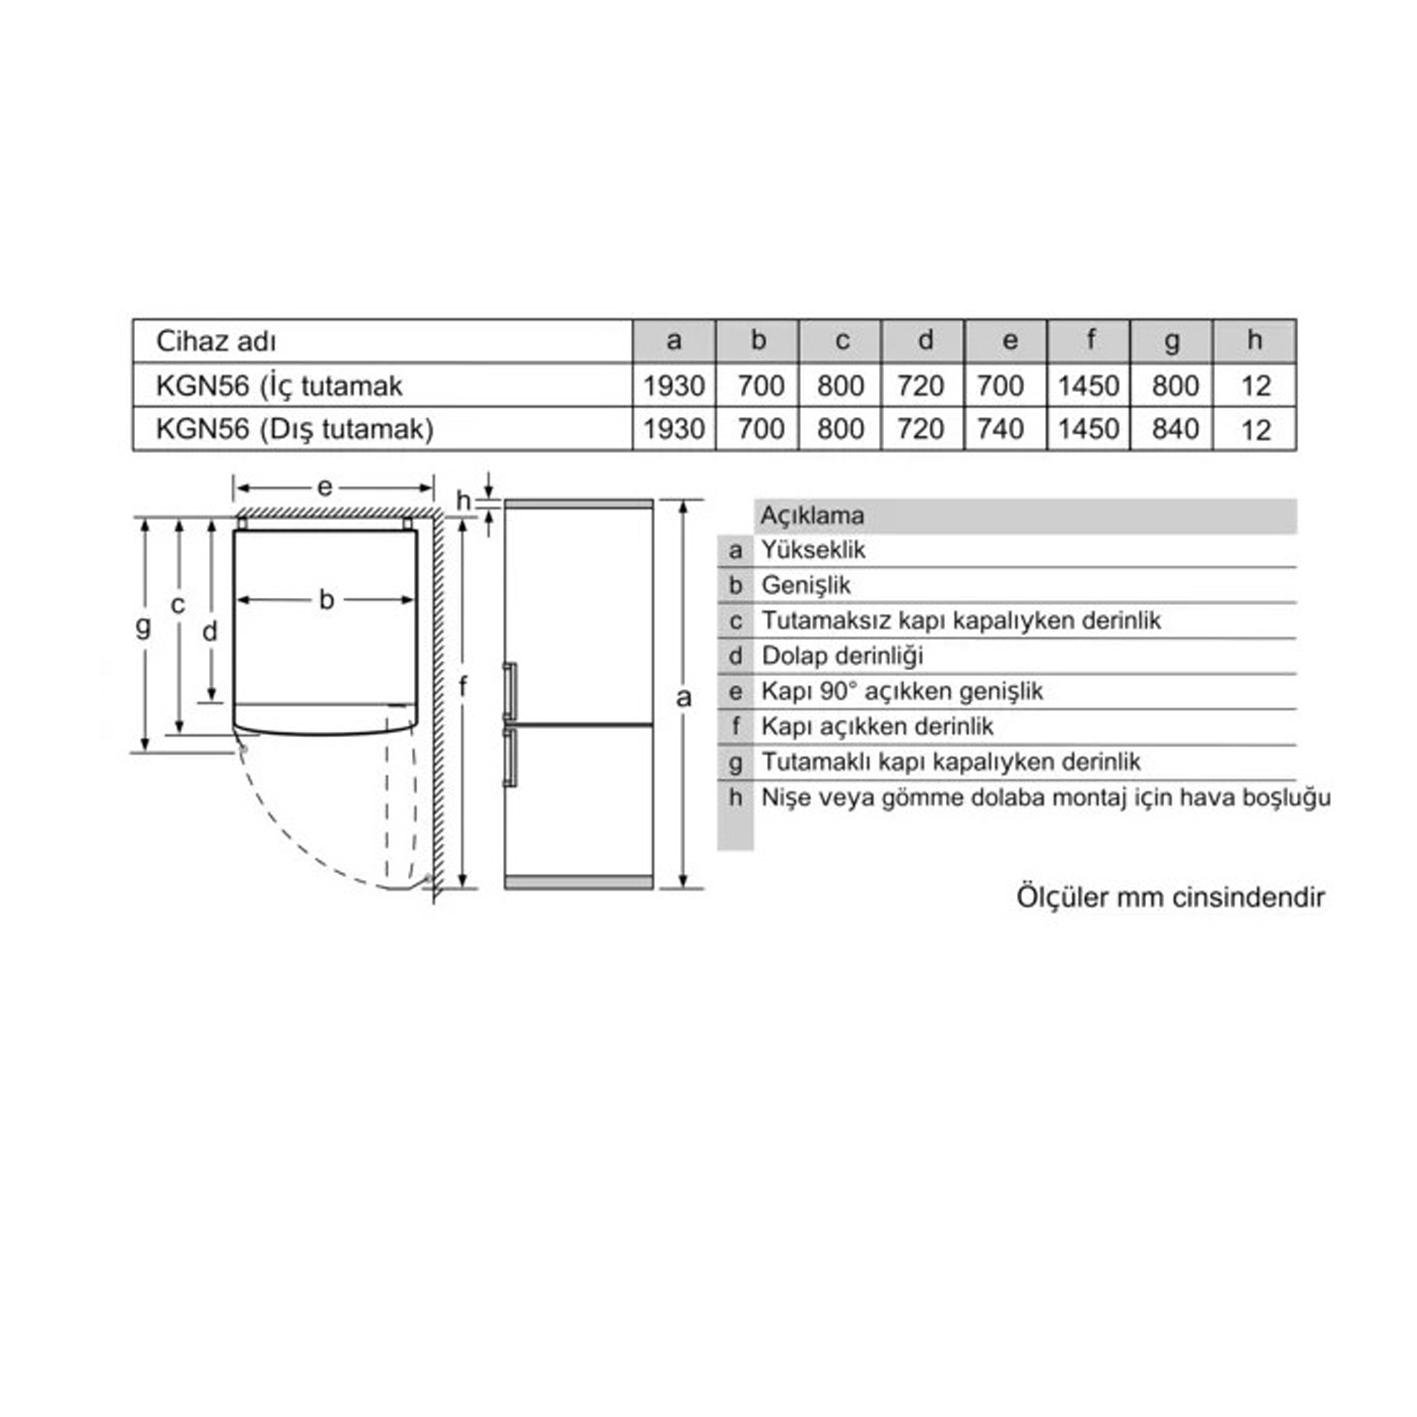 Profilo BD3056W3UN No-Frost Kombi Buzdolabı Comfort Serisi